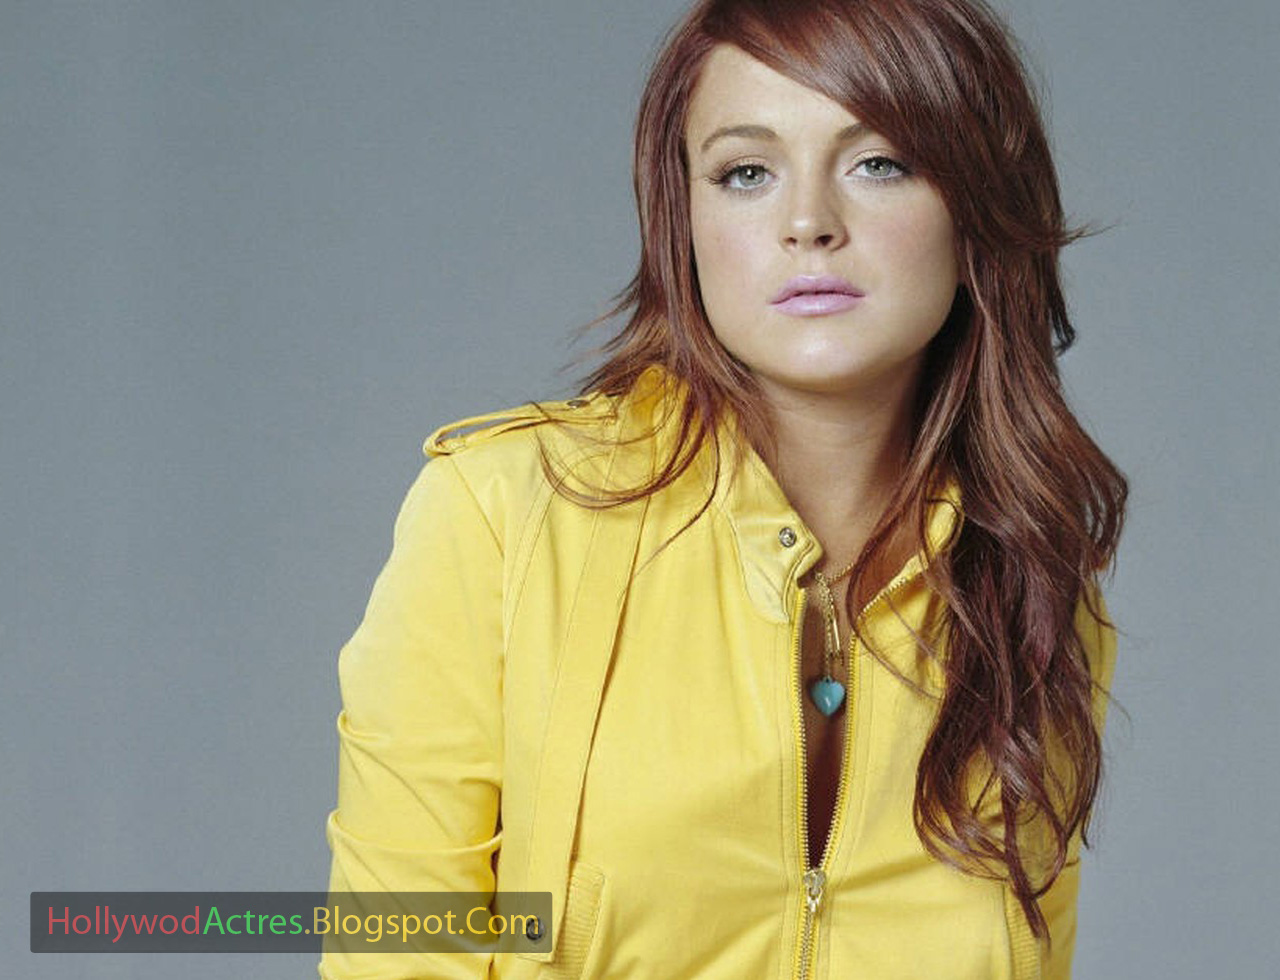 http://4.bp.blogspot.com/--X63aK6bHMs/UQkYE0Rx7RI/AAAAAAAAIYc/-U94oIOxkSw/s1600/Lindsay+Lohan+7.jpg